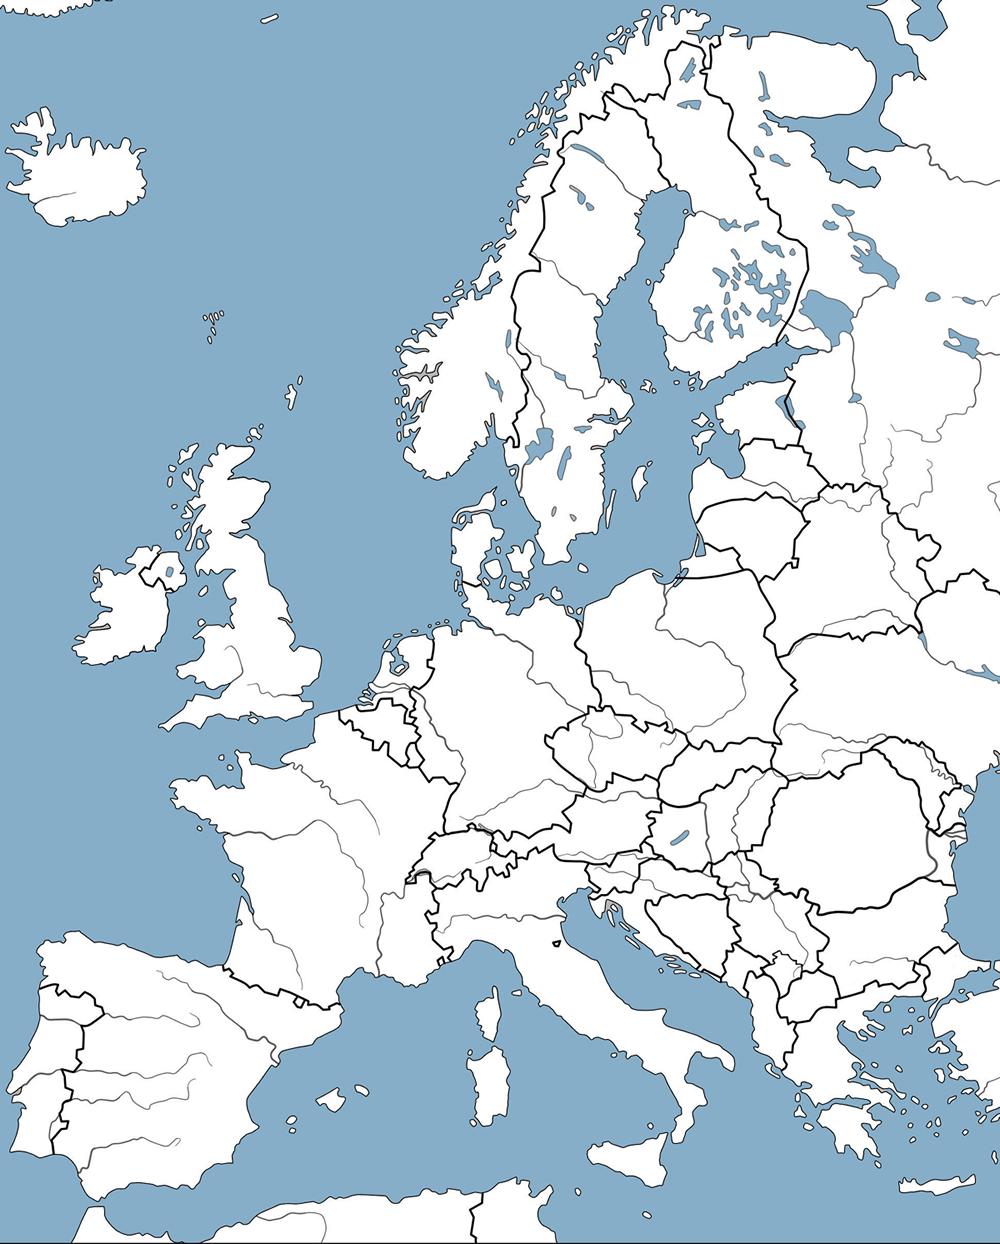 Mapa Fisic Catalunya Mut.Espana Madrid Catalunya Barcelona Portugal Lisboa F